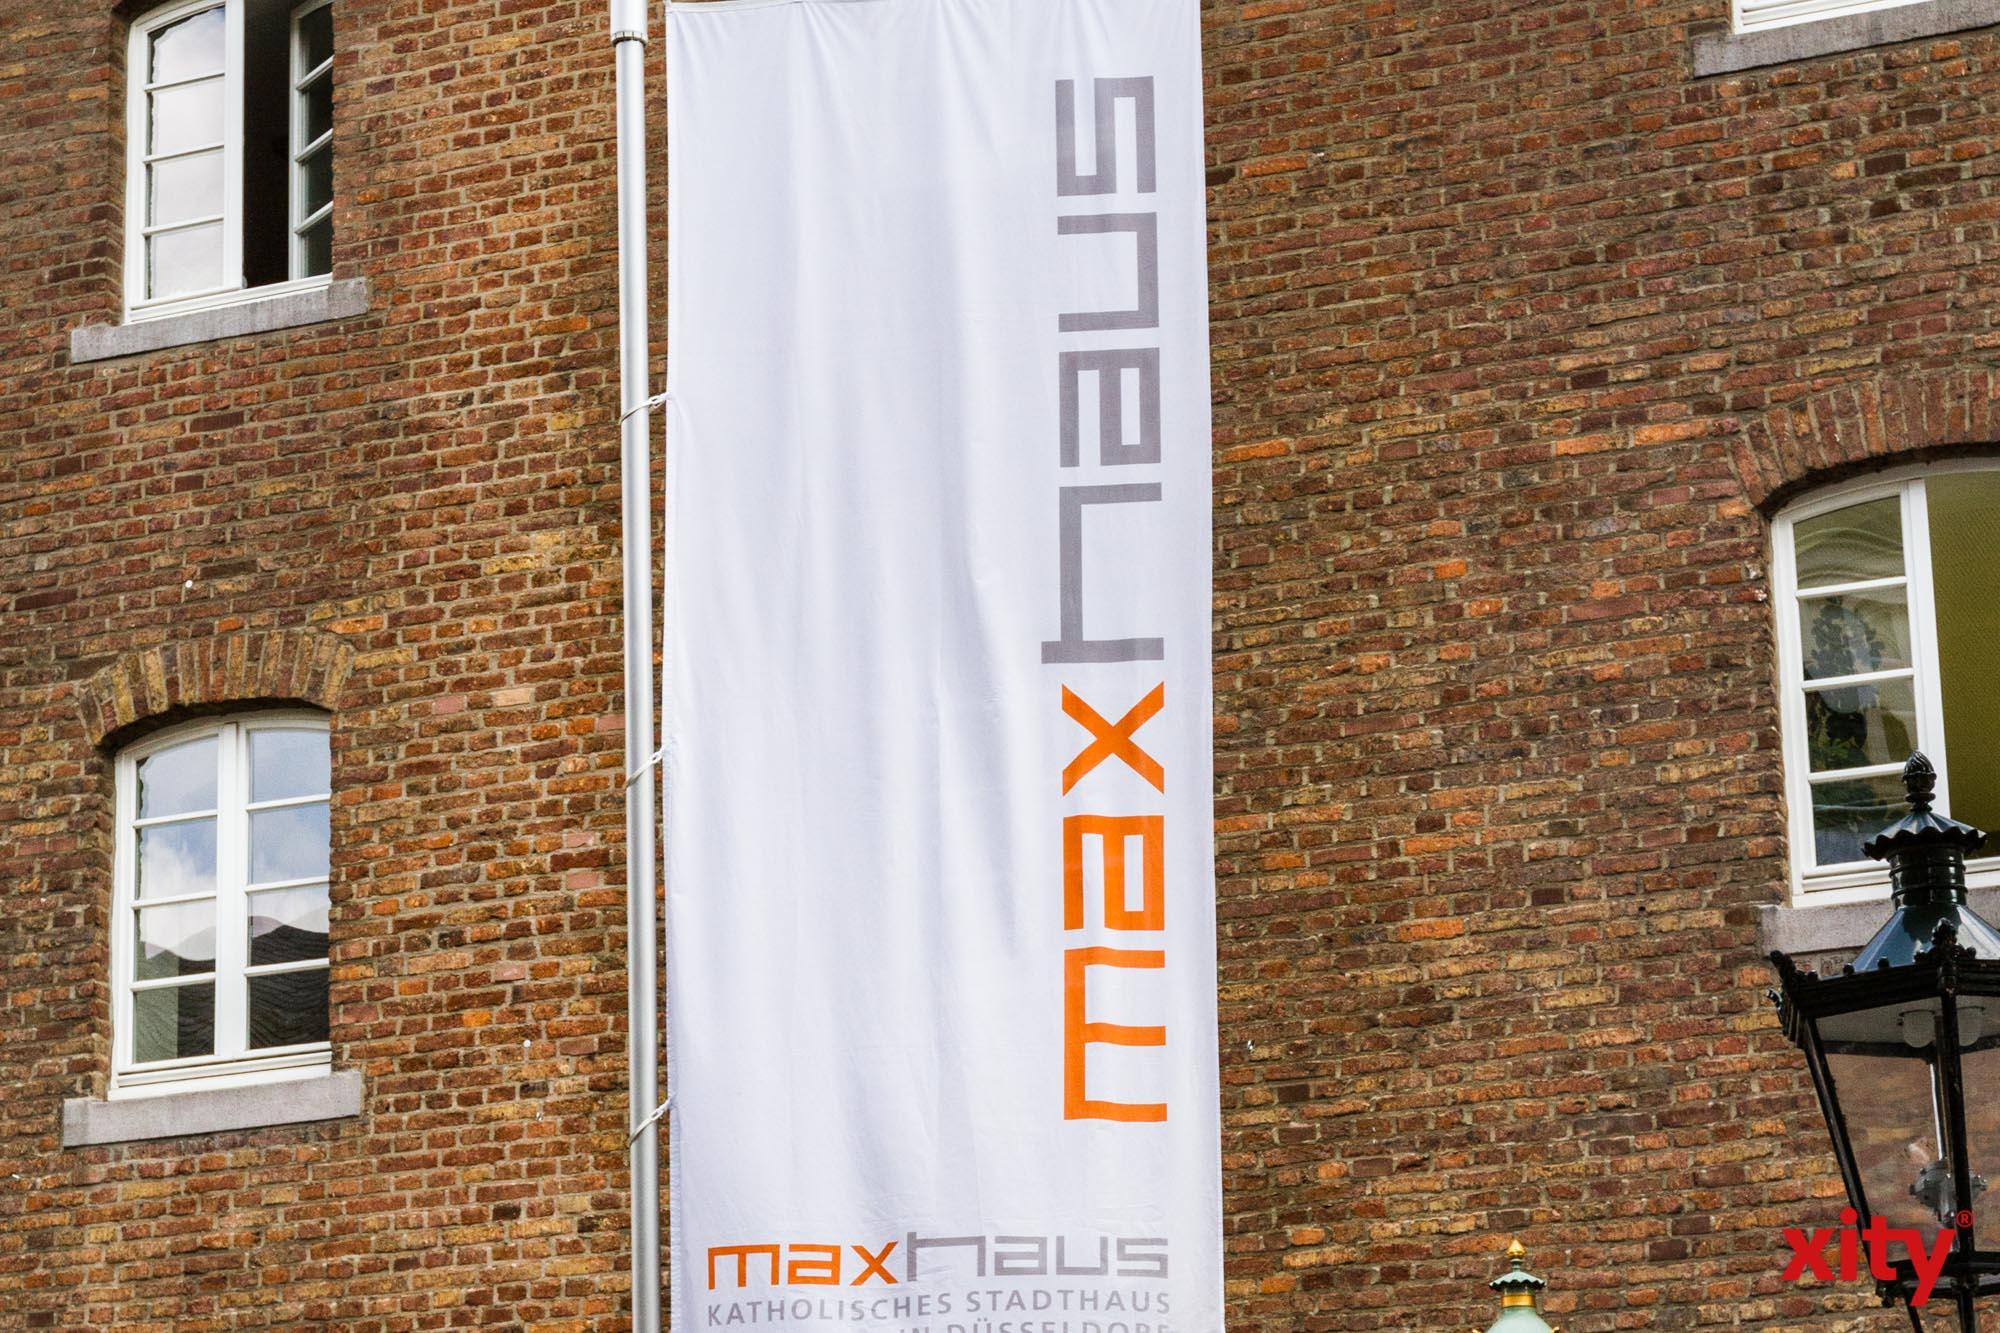 Digitale Angebote des Maxhaus Düsseldorf im Mai 2021 (Foto: xity)